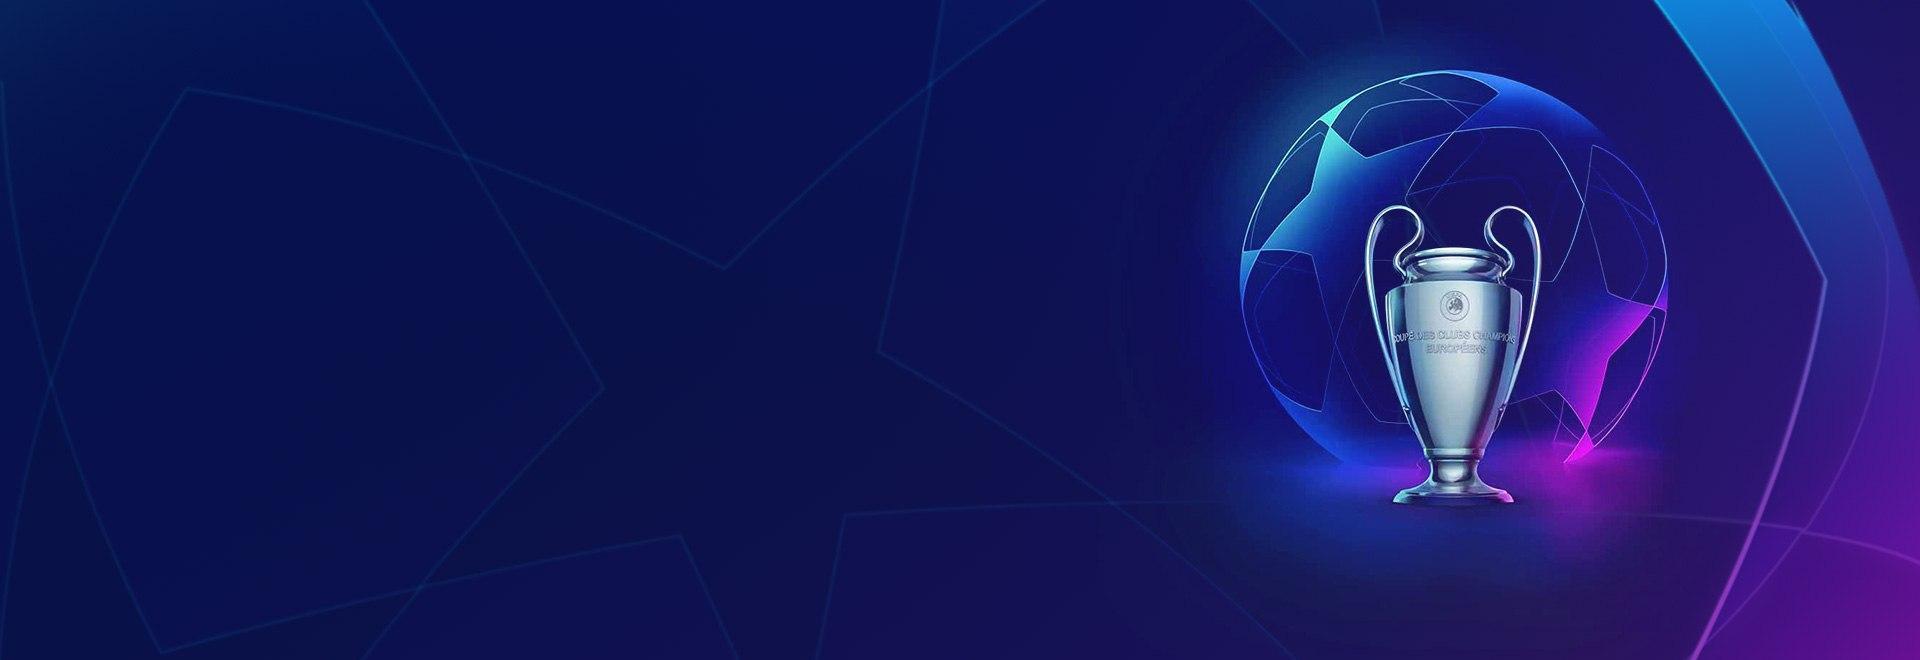 Inter - Real Madrid